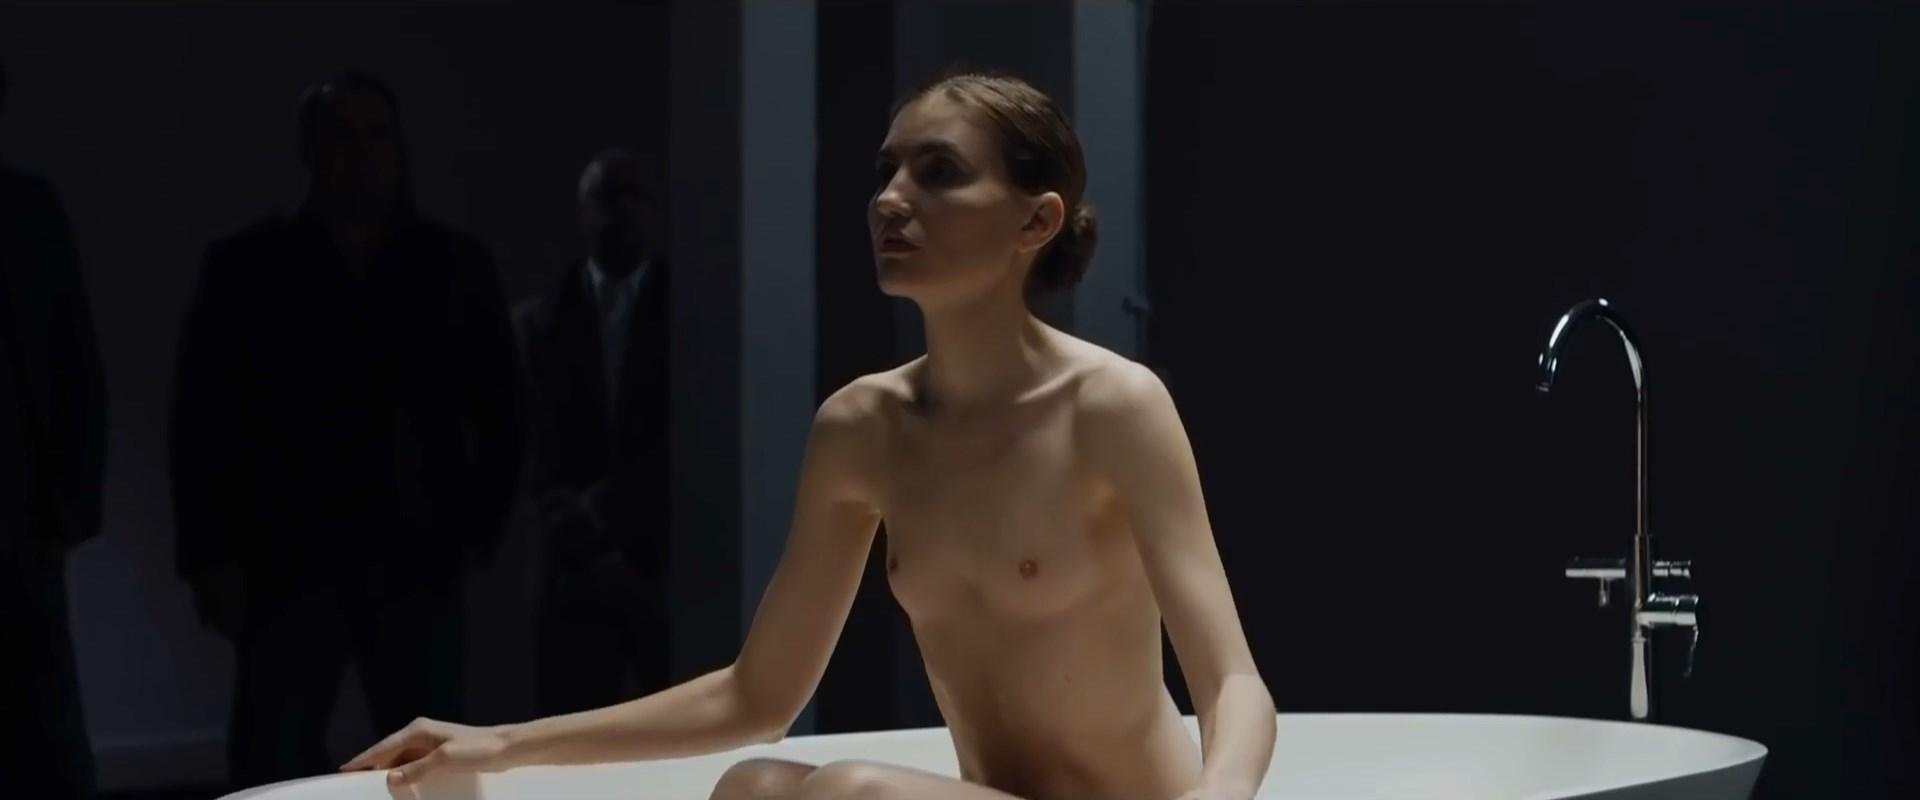 Édith Le Merdy  nackt